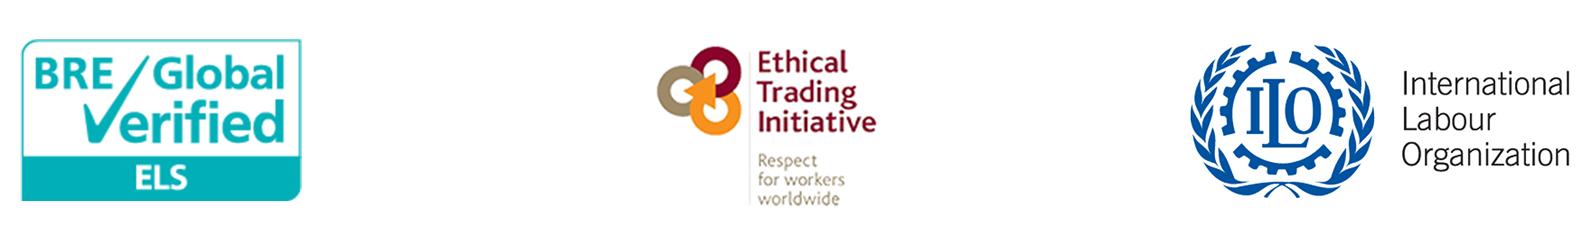 BRE Global Verified ELS ETI ILO